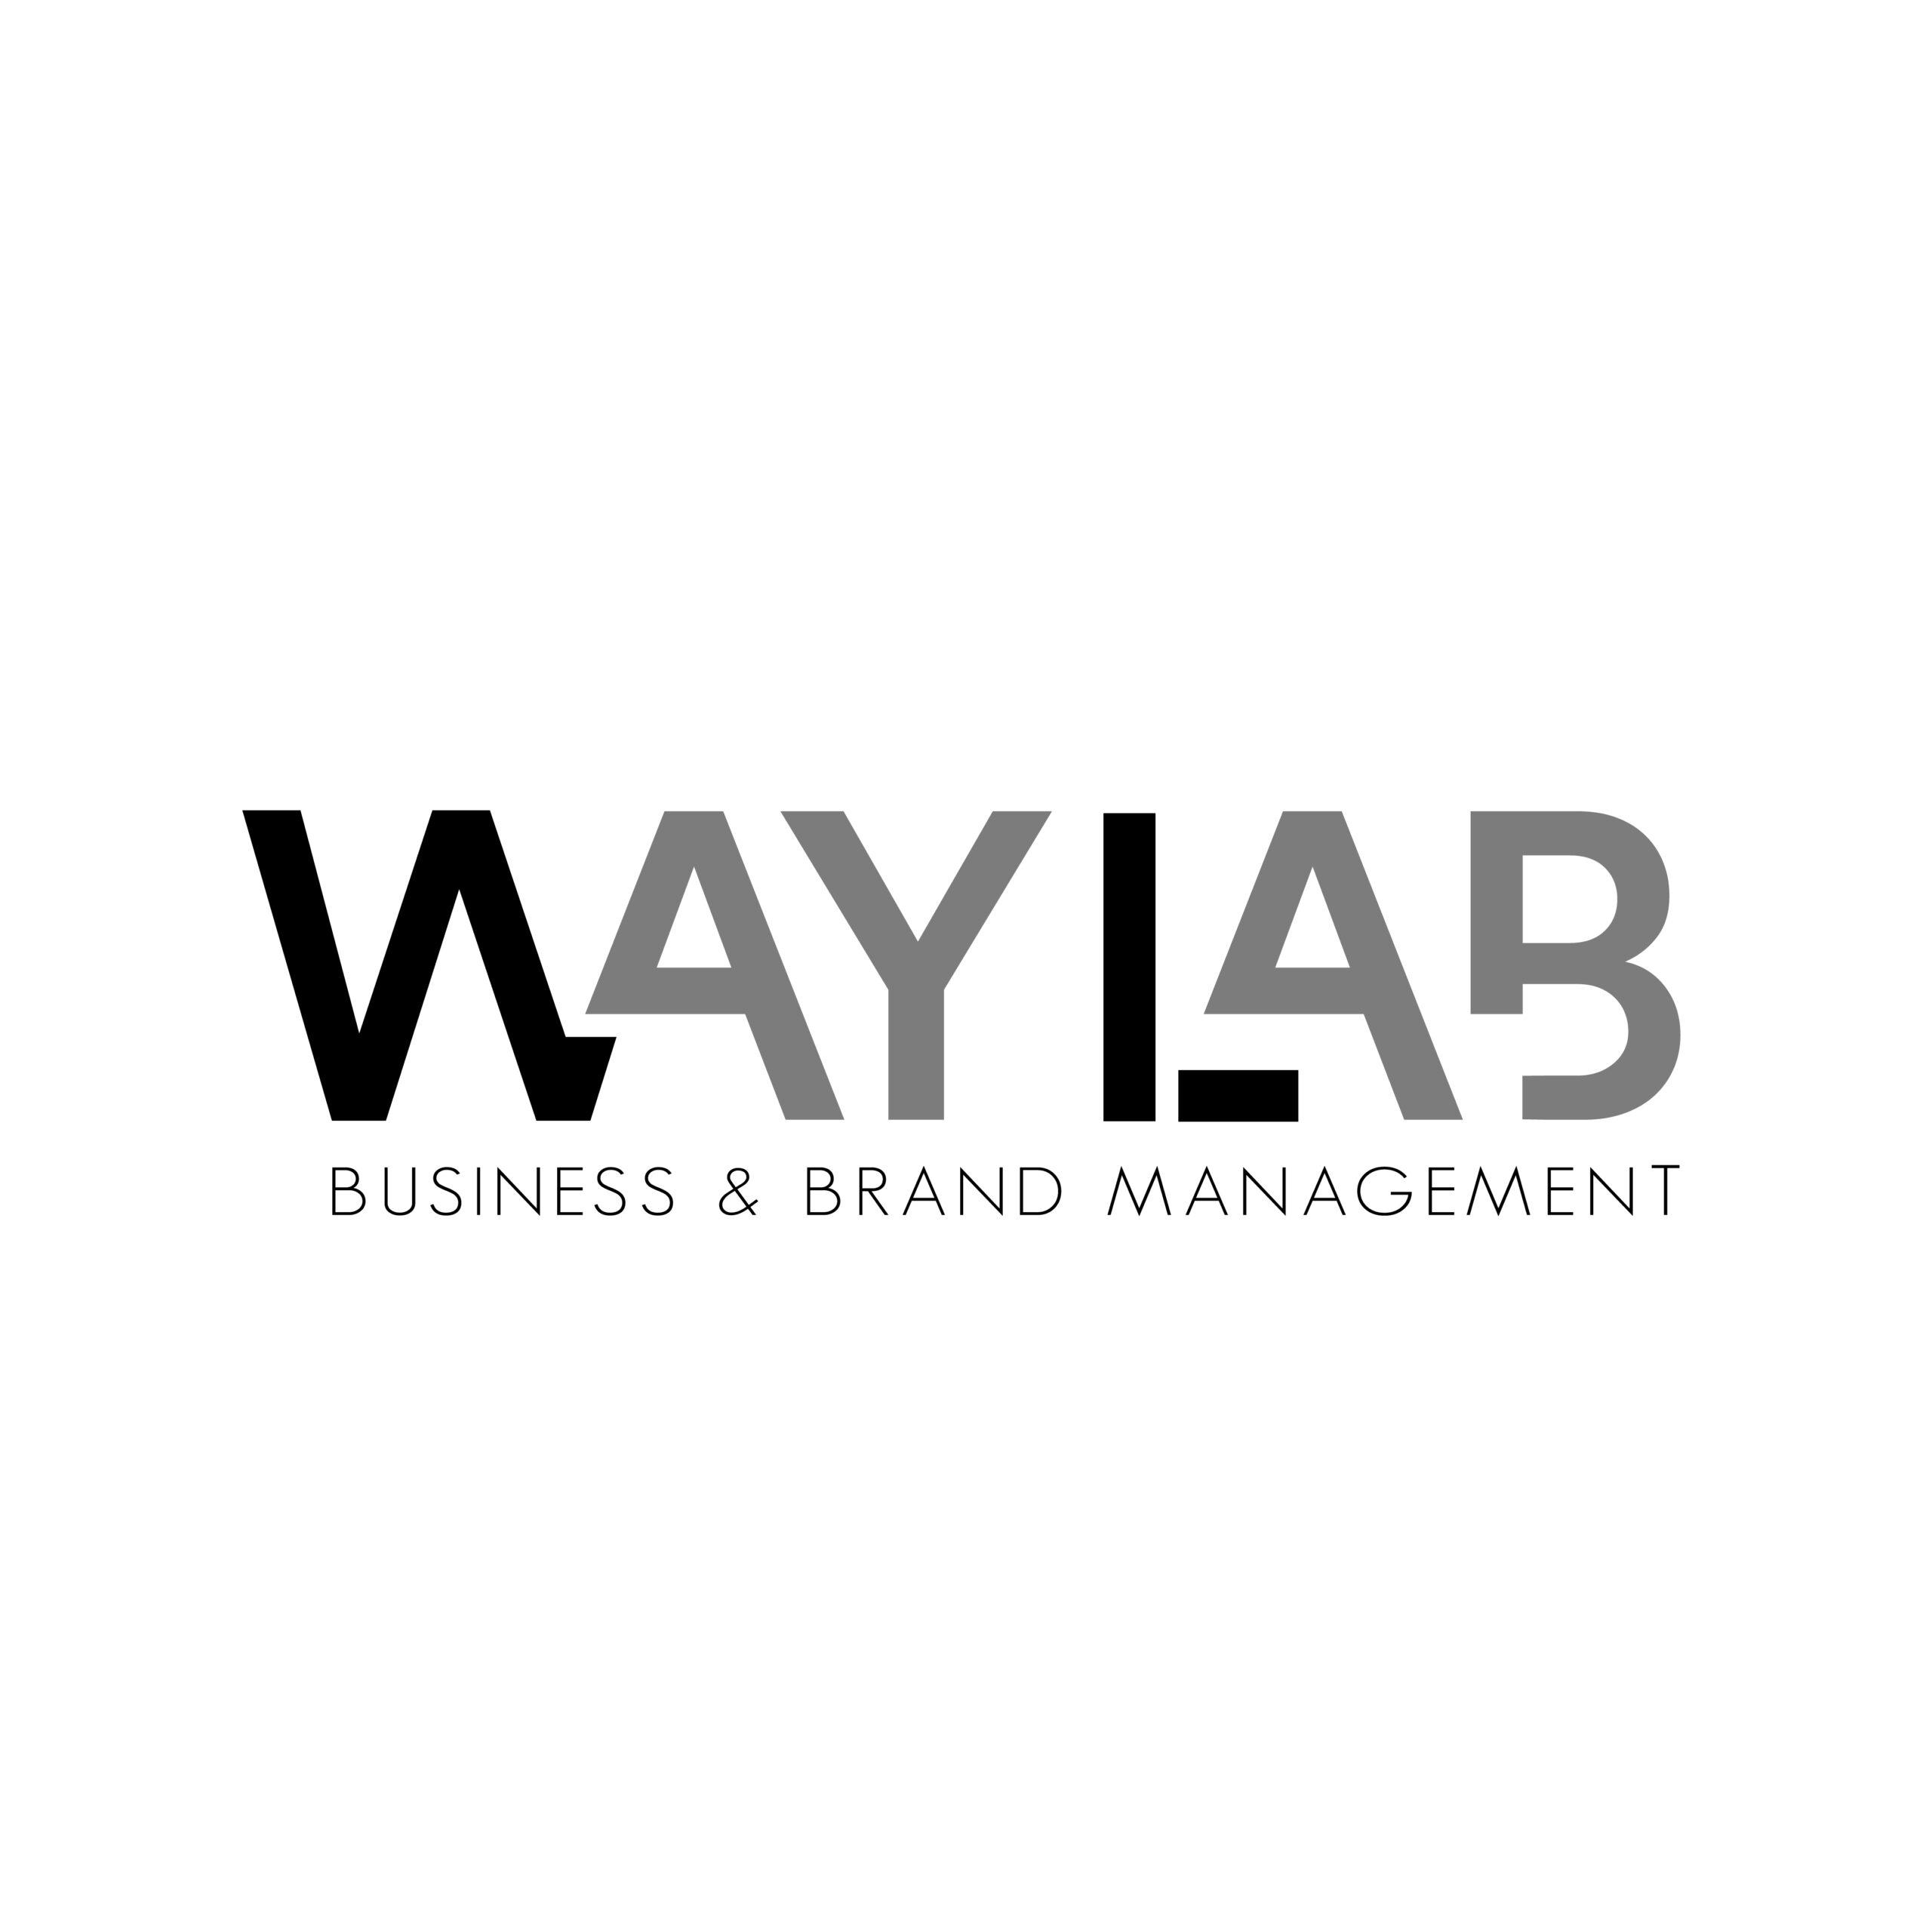 WAYLAB